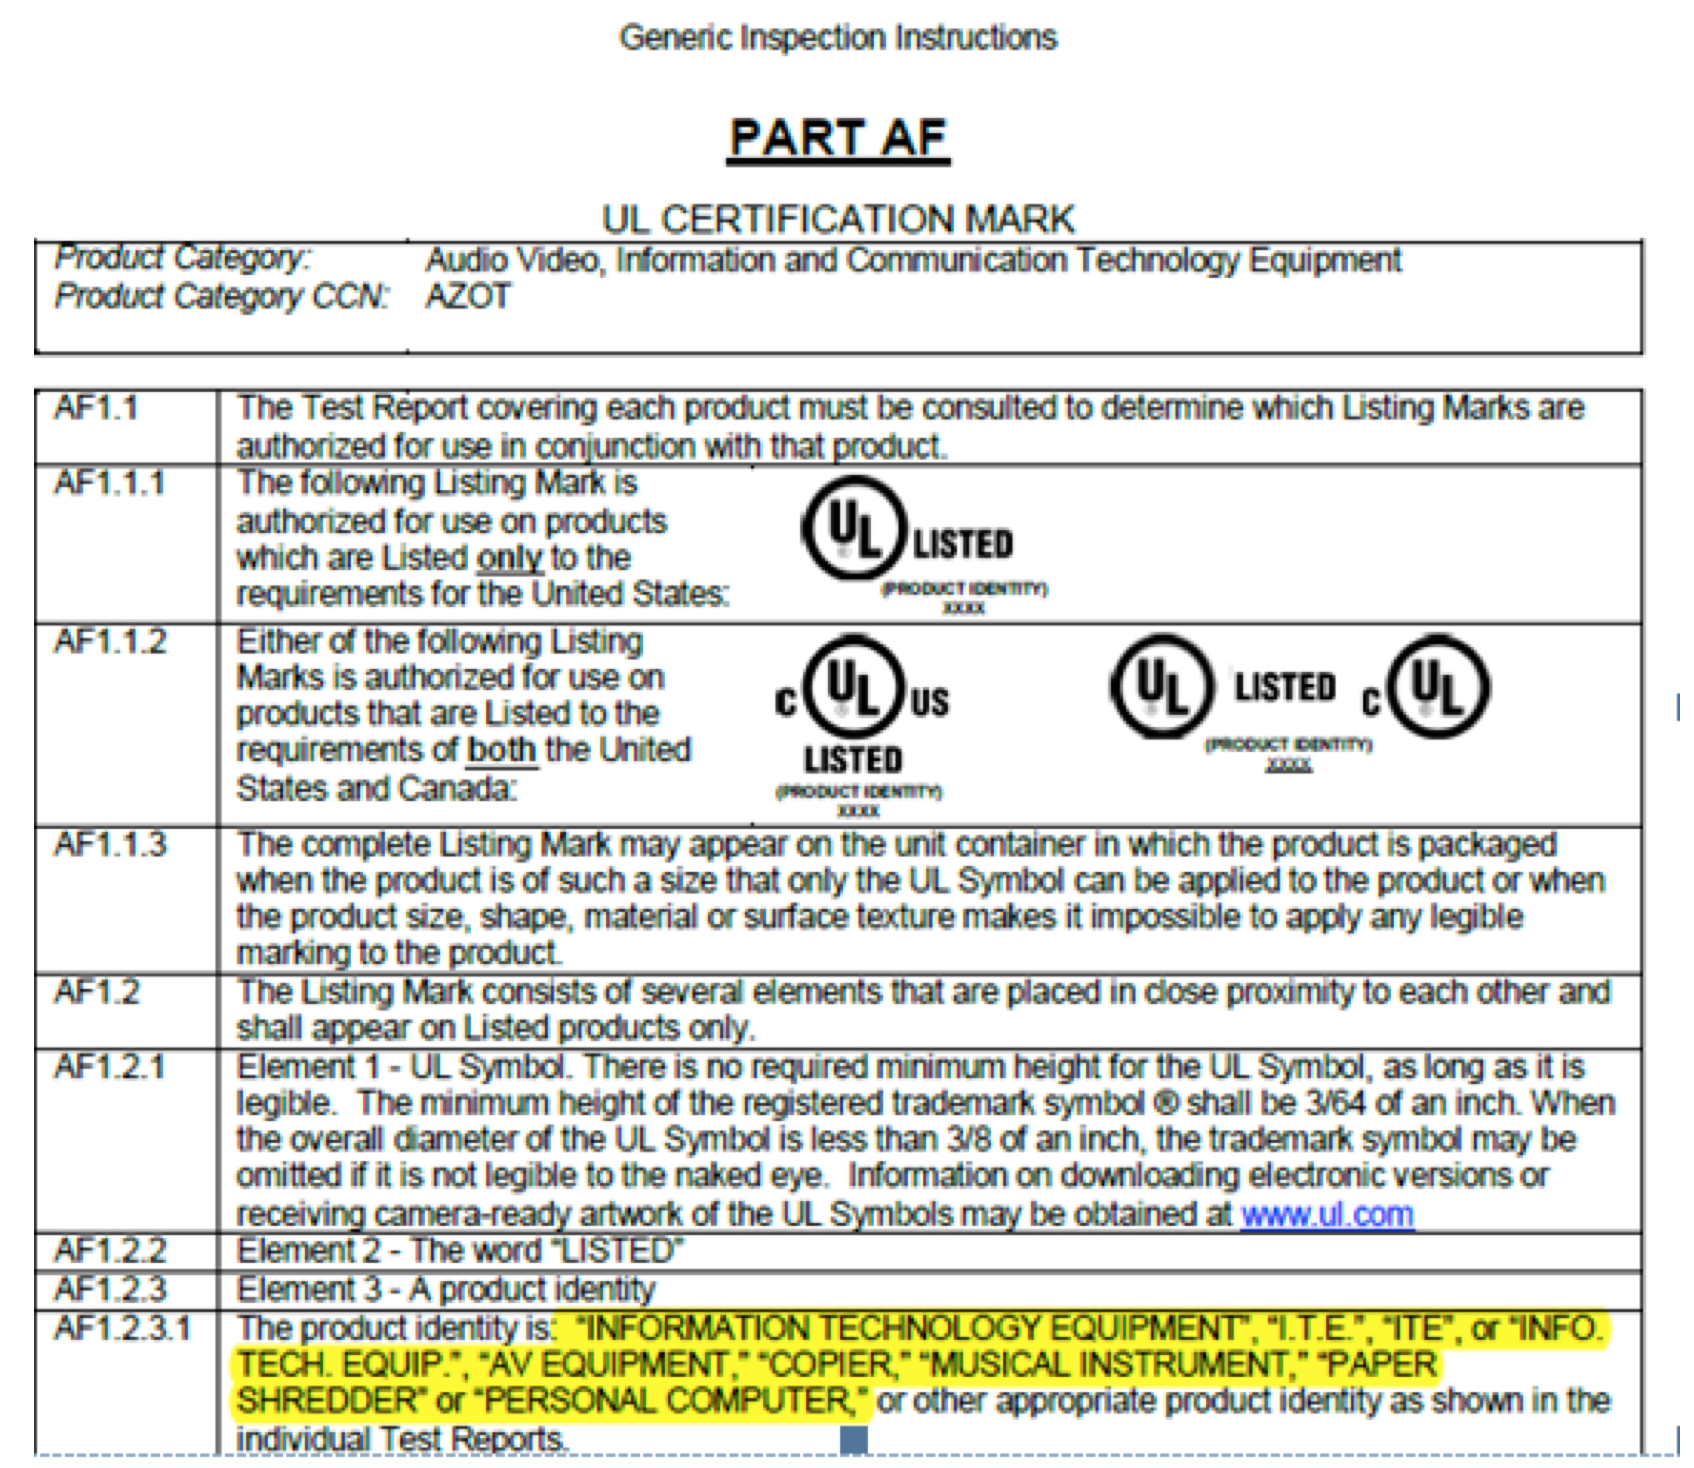 UL 62368-1, UL Mark Product Identity標示要求